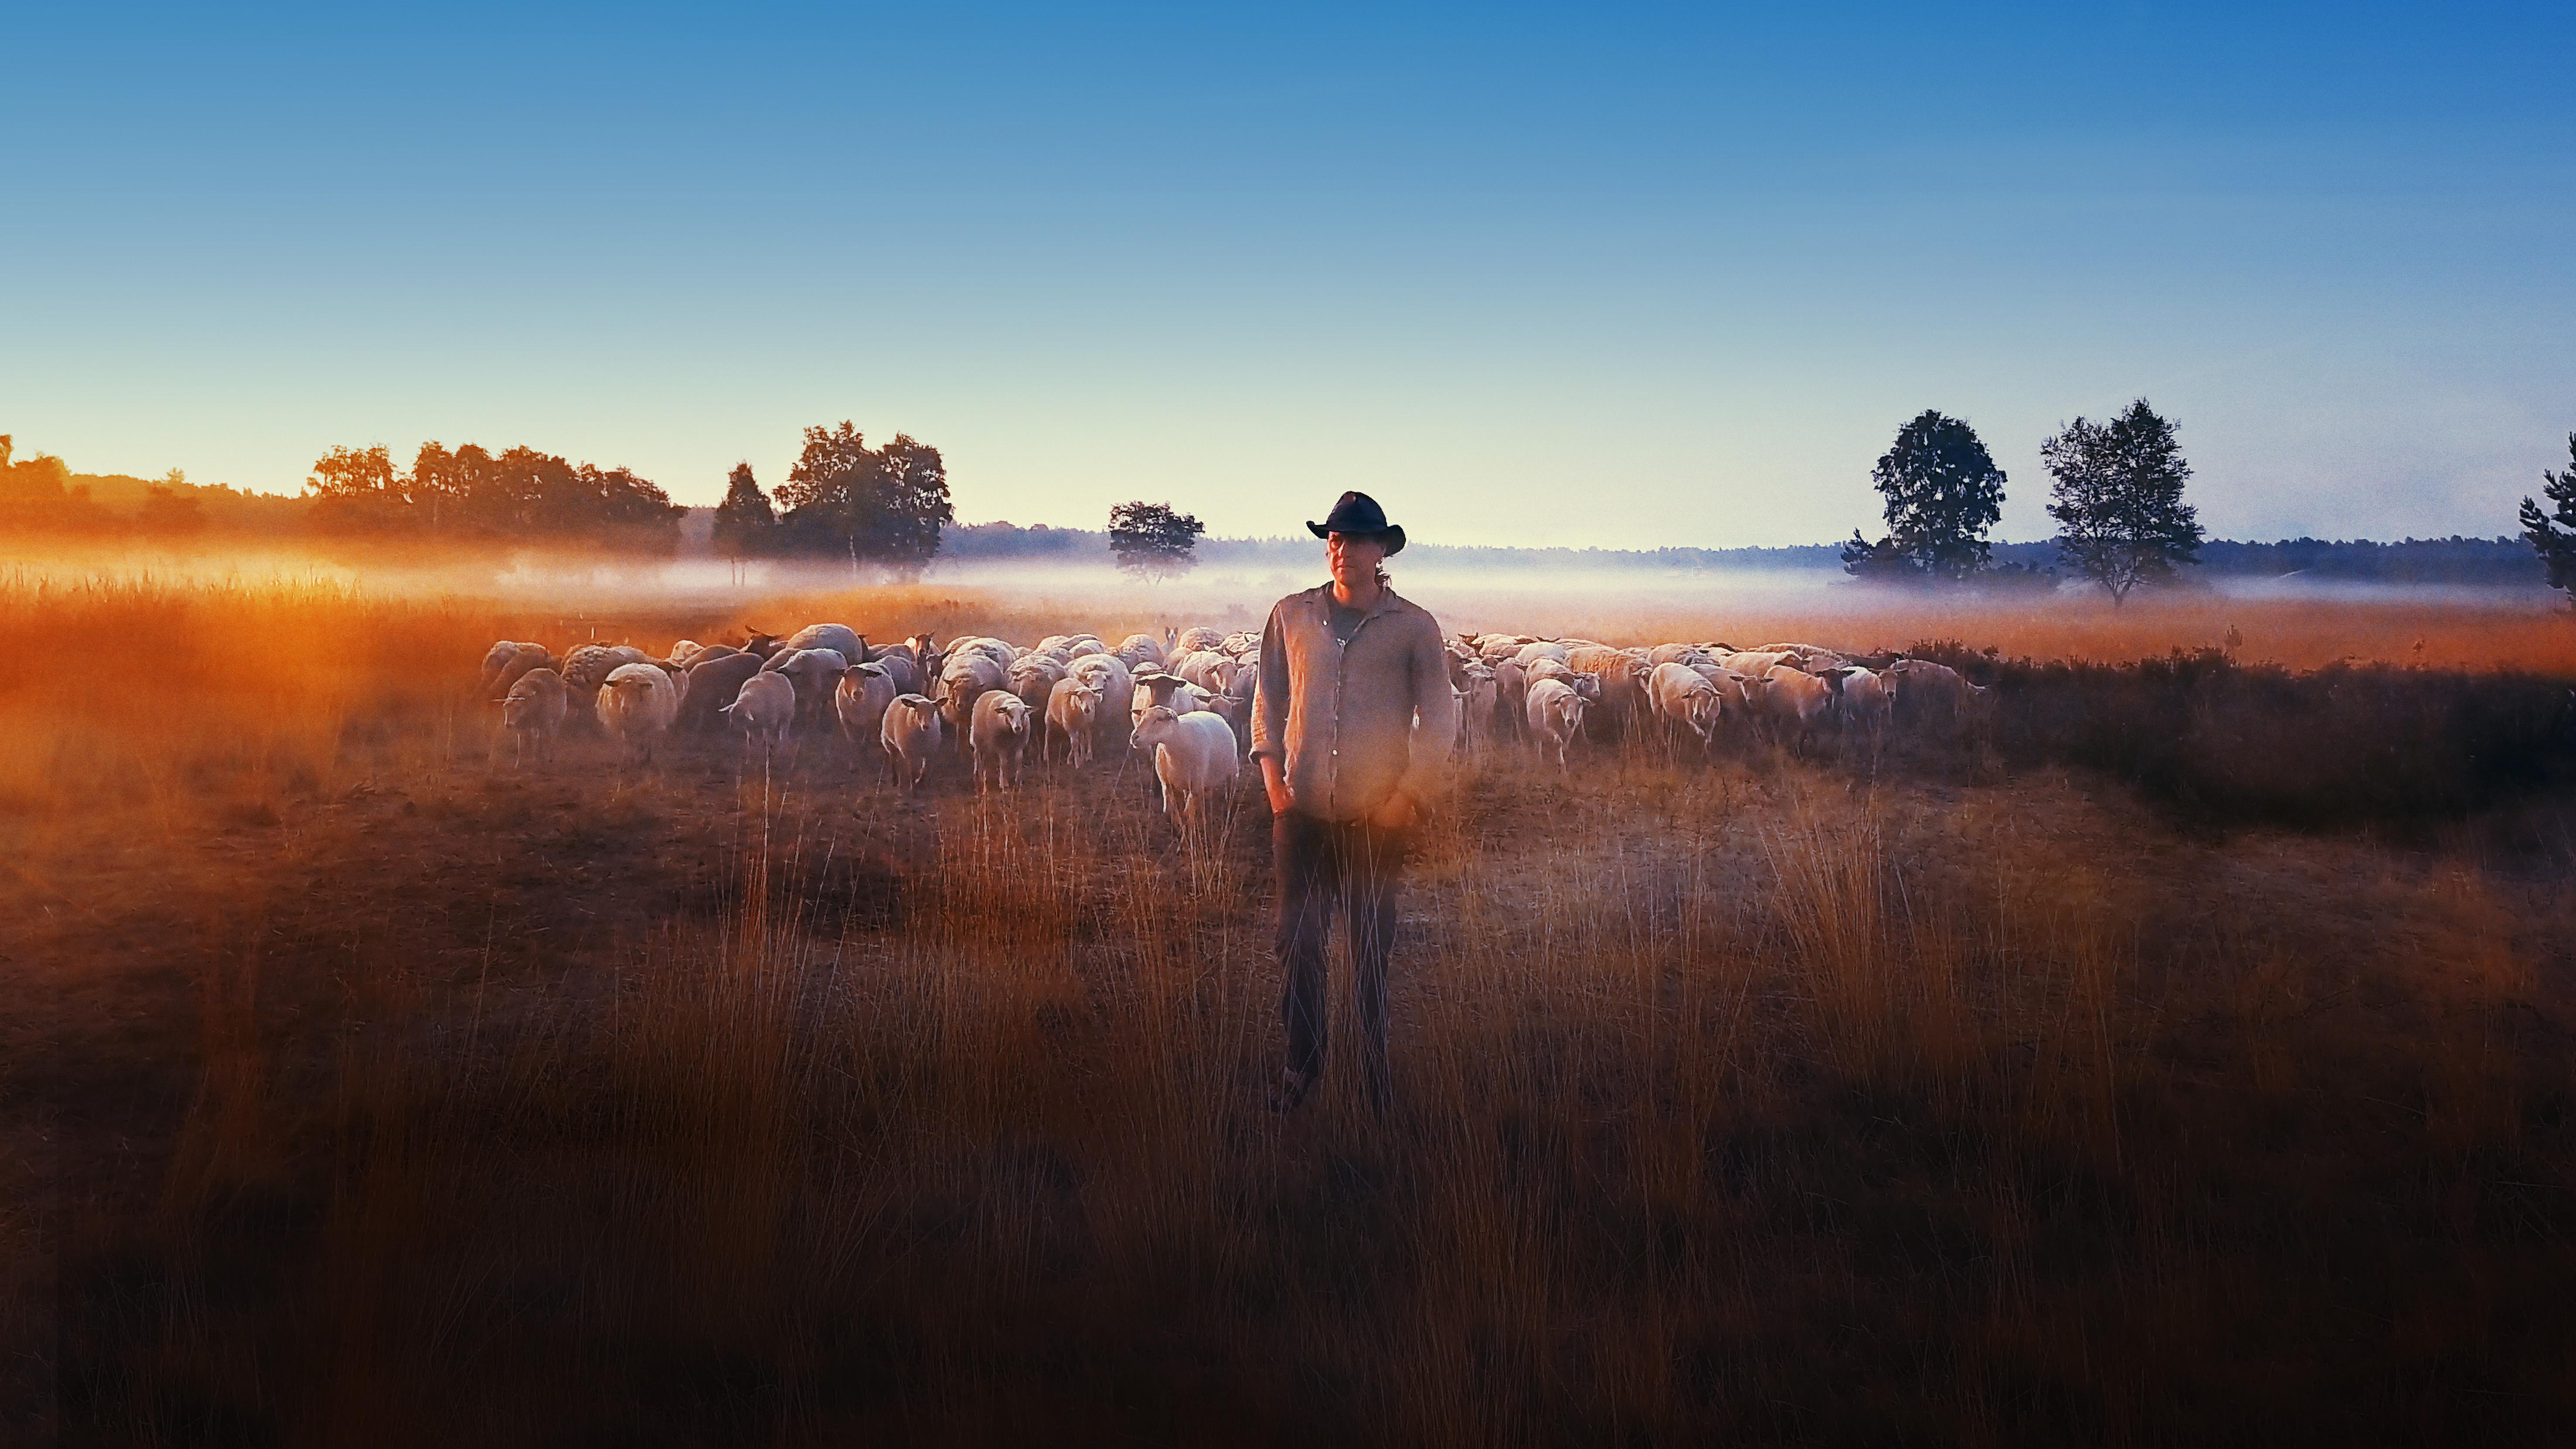 SHEEP HERO poster image Stijn Hilgers